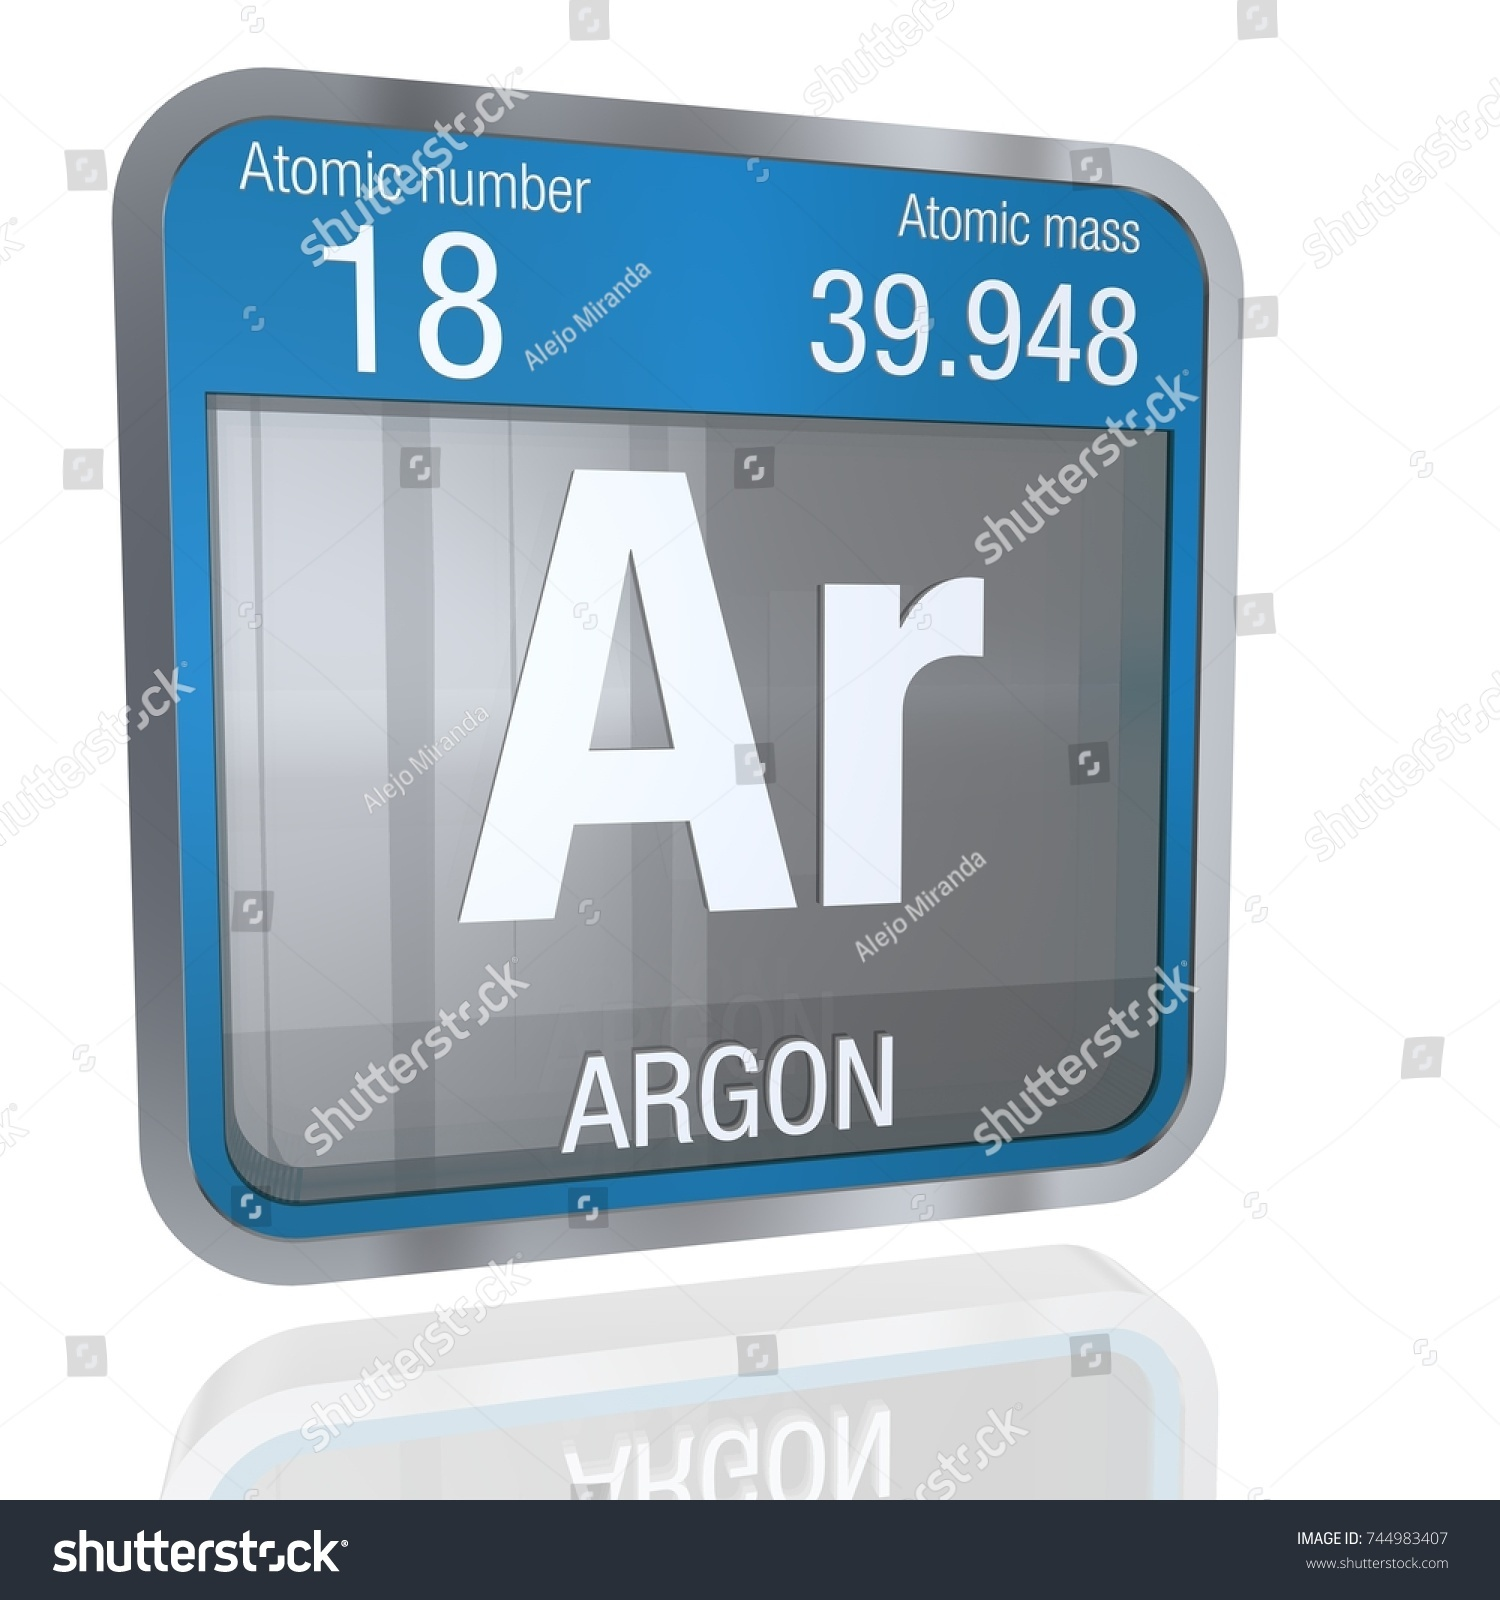 Argon symbol square shape metallic border stock illustration argon symbol in square shape with metallic border and transparent background with reflection on the floor gamestrikefo Choice Image